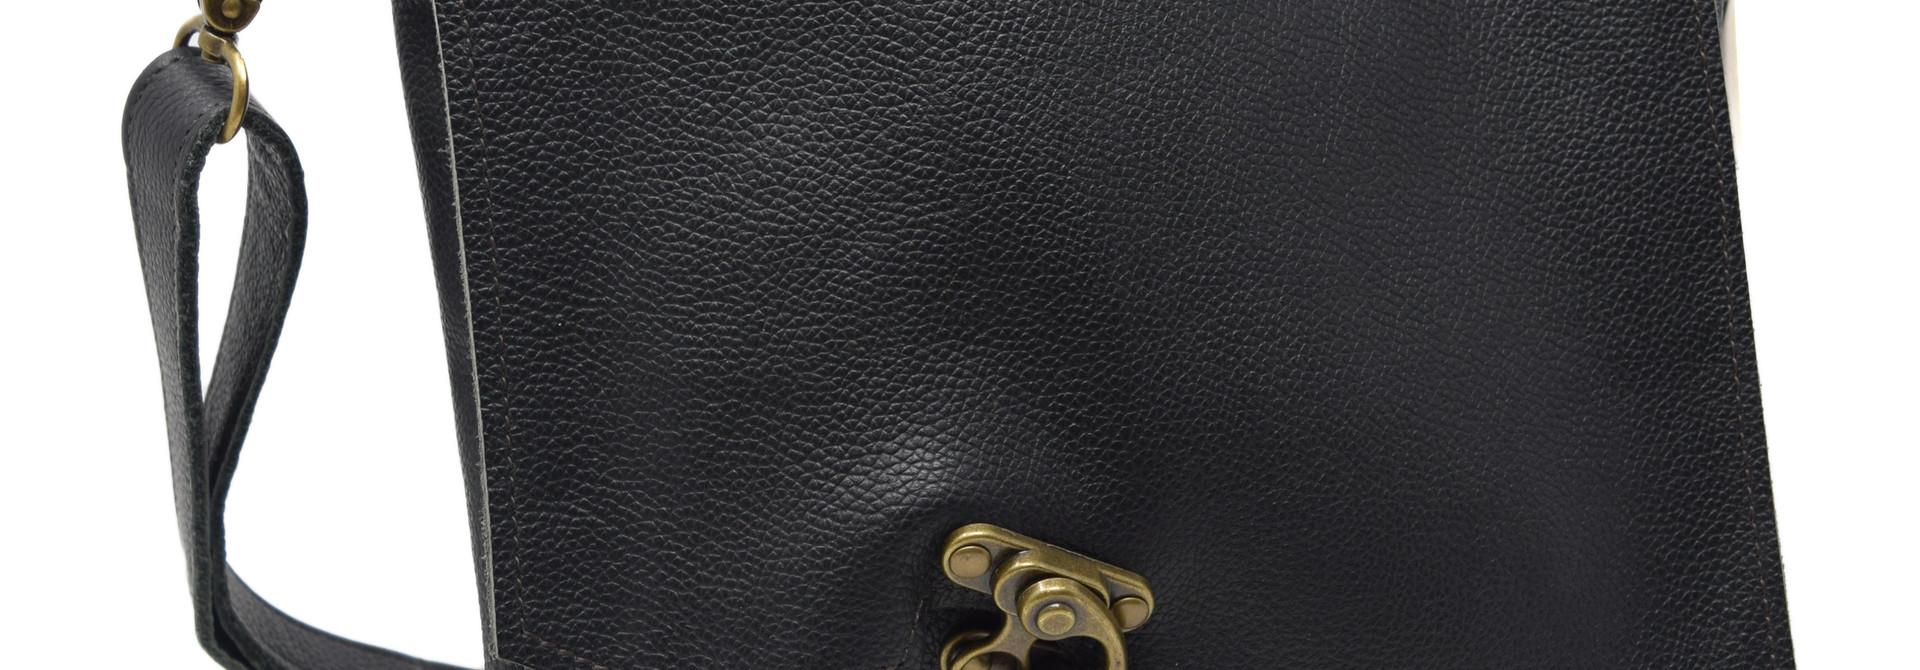 Leather Crossbody Black Textured